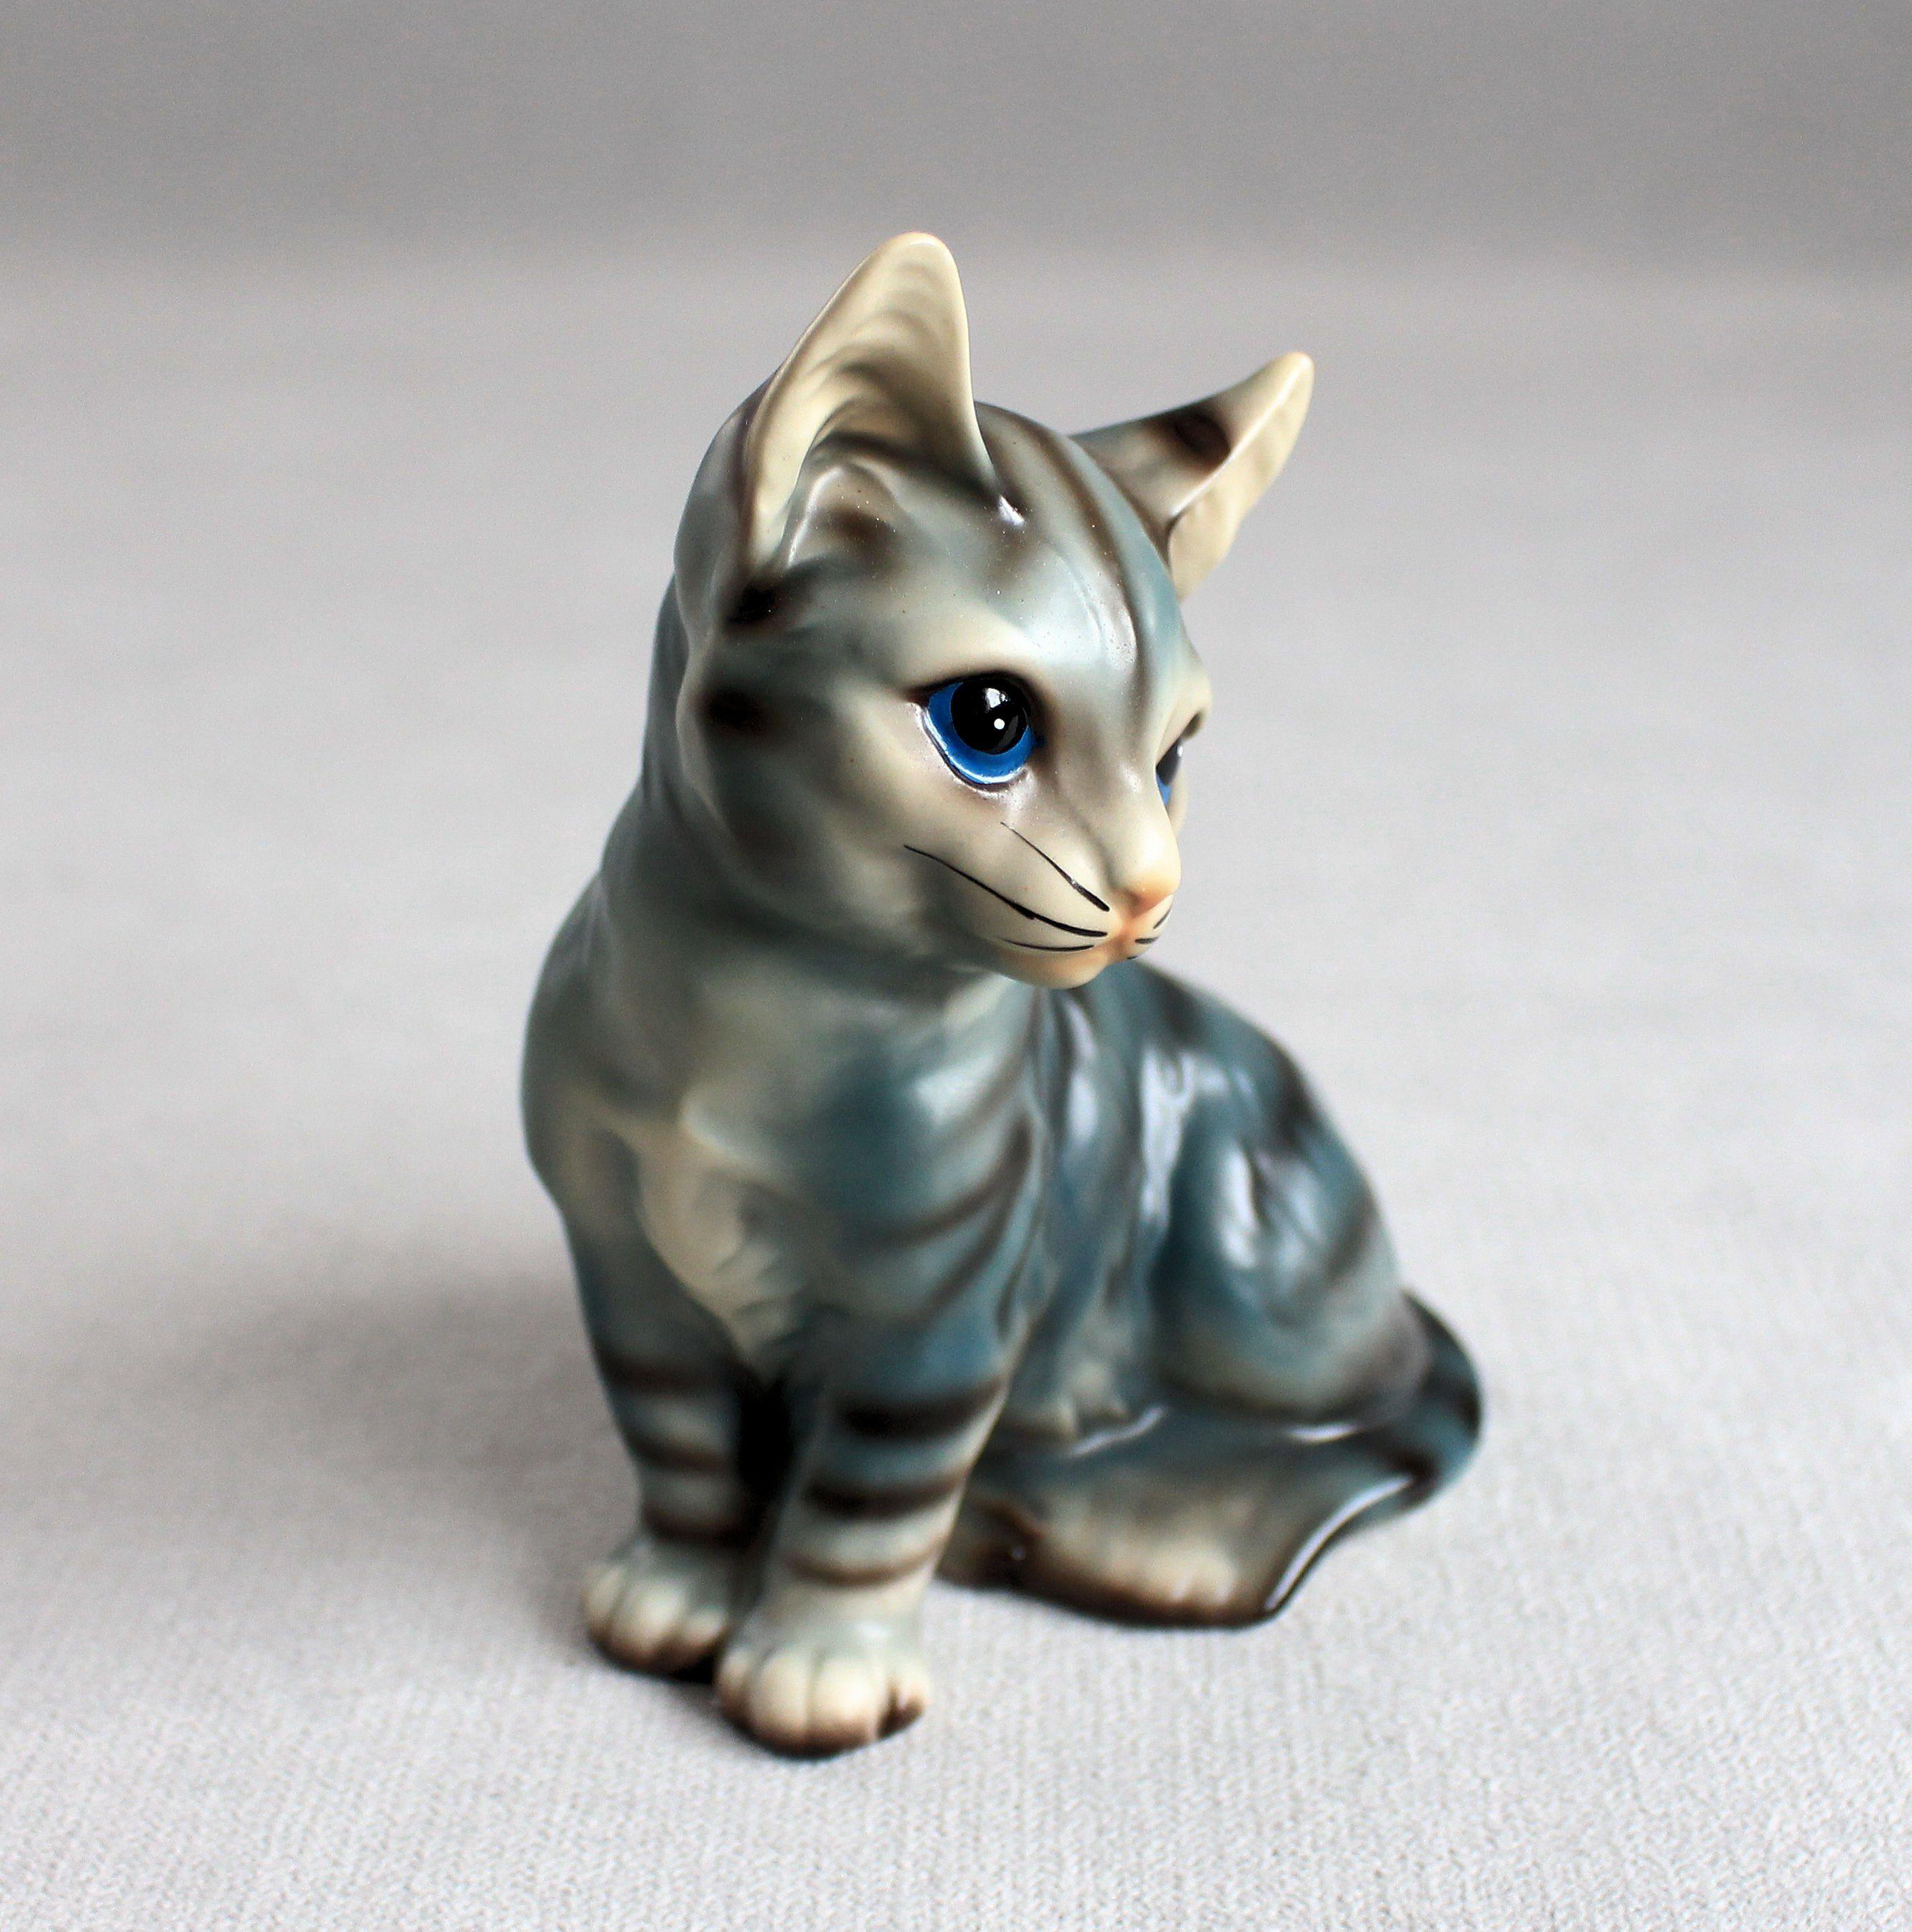 Vintage Ceramic Cat Porcelain Cat Figurines Blue Eyes Cat Blue And Brown Kitten Fine Ceramic Japanese Art Siamese Ca In 2020 Cute Baby Animals Brown Kitten Kitten